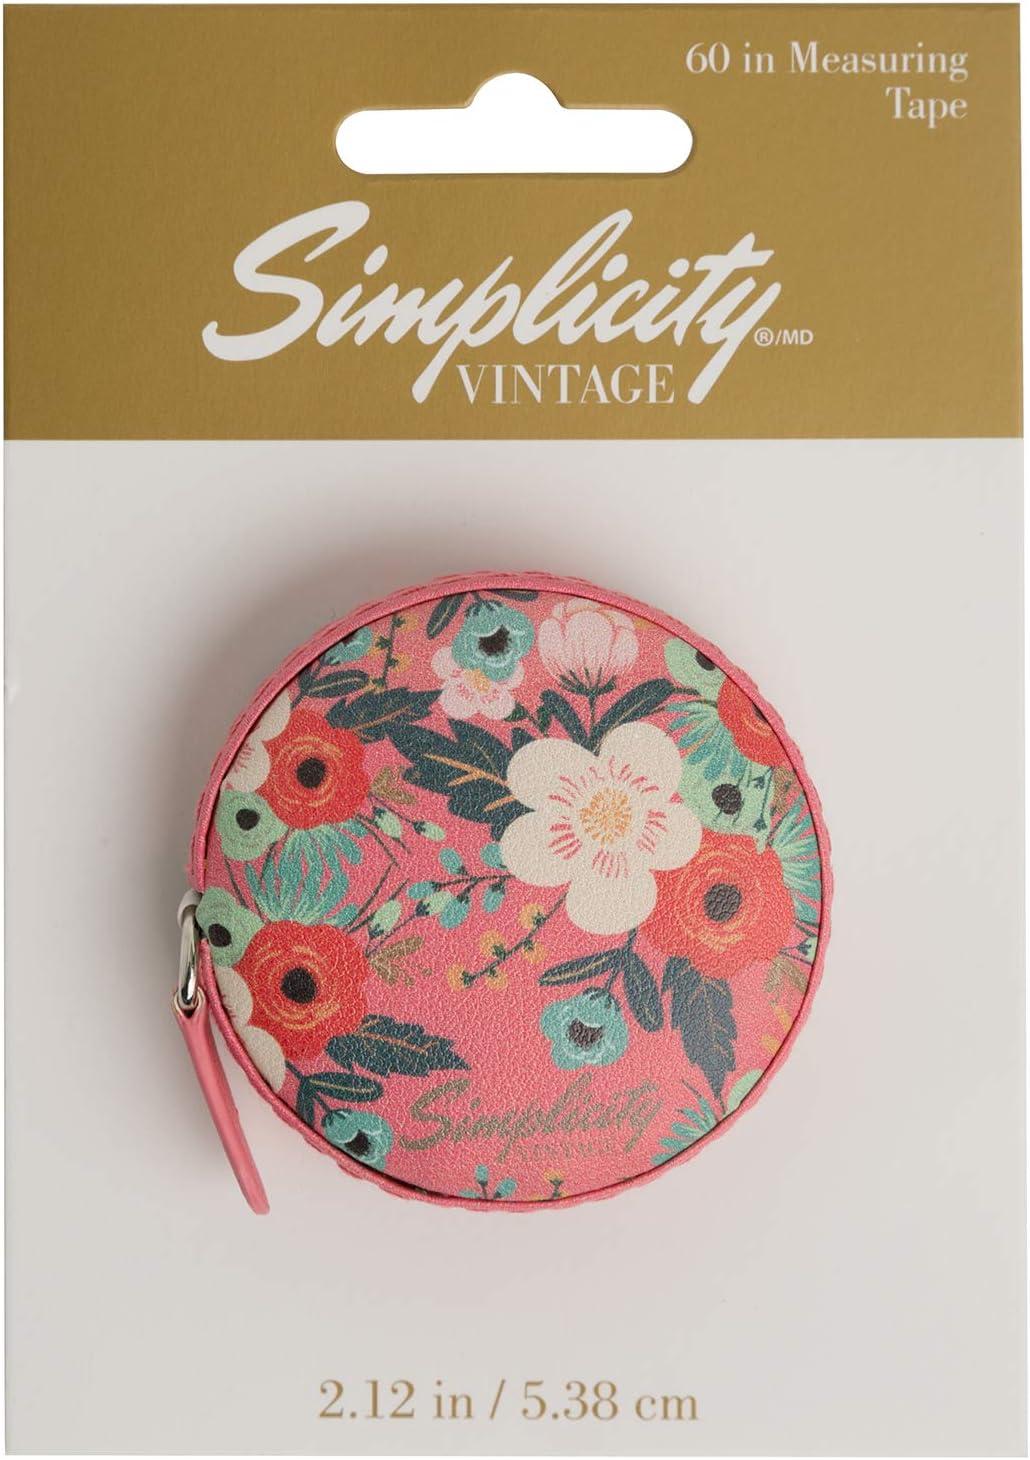 Simplicity Over item handling Vintage Fashion Floral Tape Finally popular brand Measuring Measure Sewing